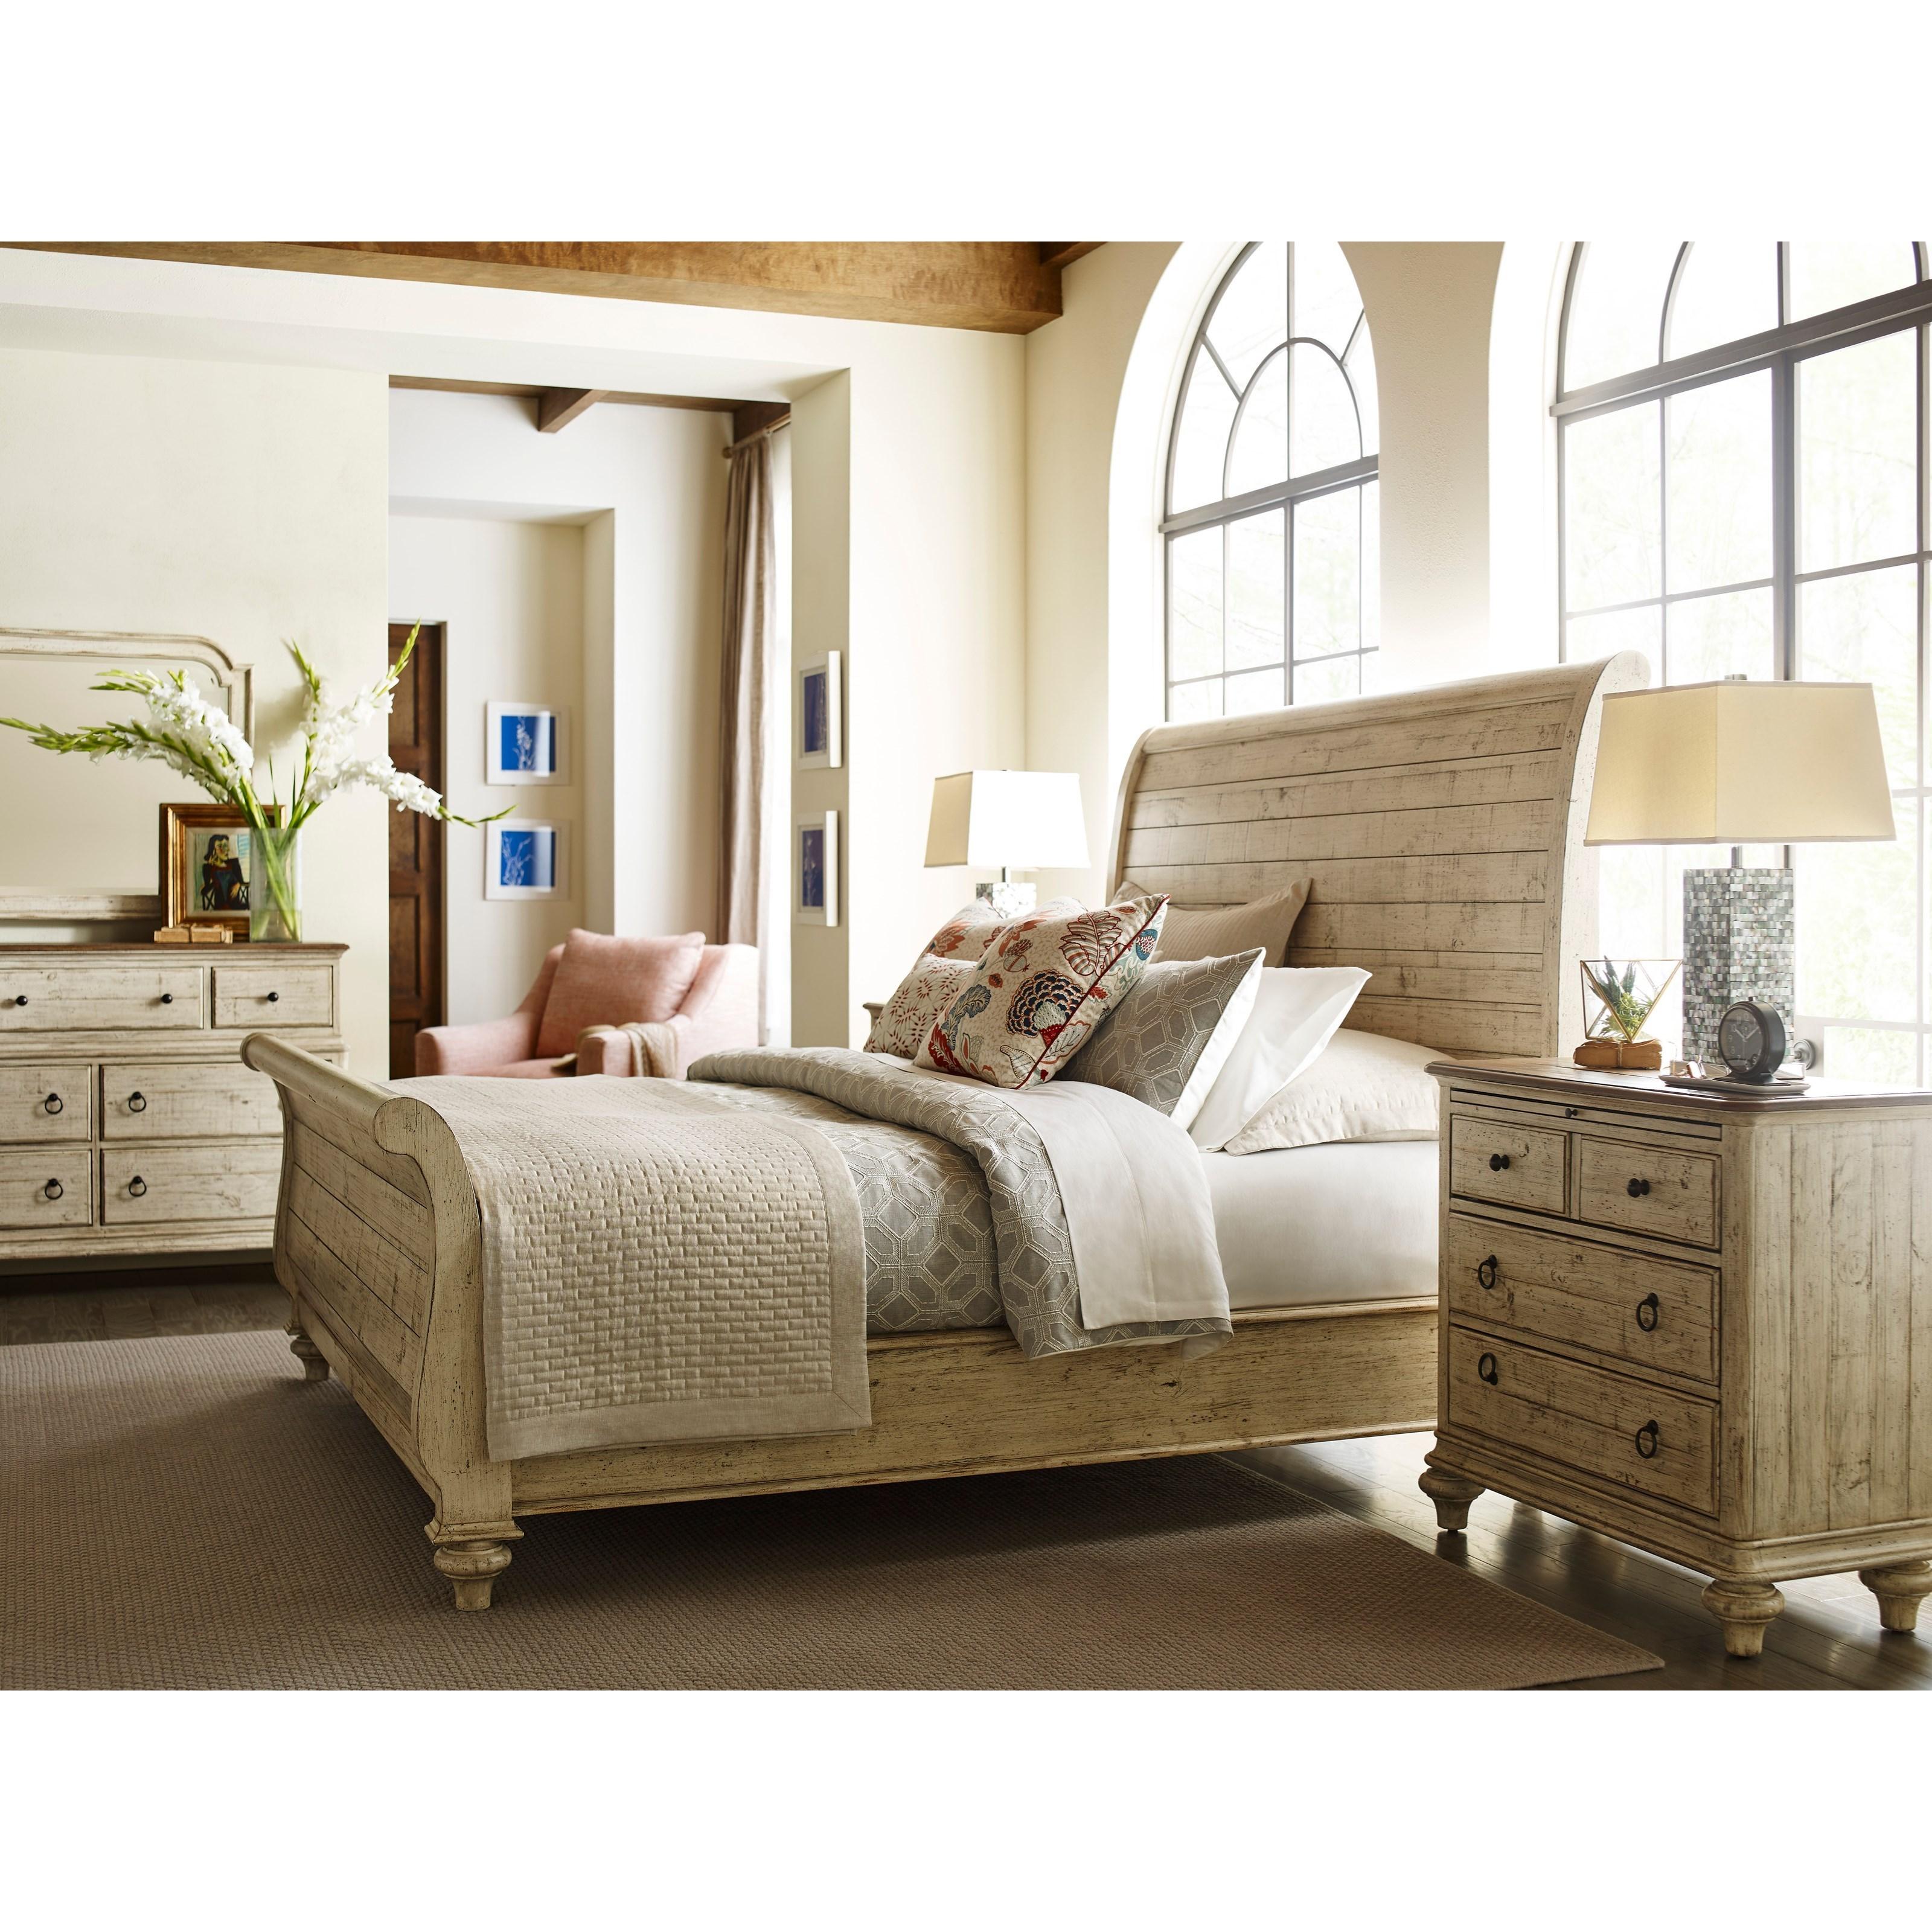 Kincaid Furniture Weatherford Lynton Sleigh Bed King Size Jacksonville Furniture Mart Sleigh